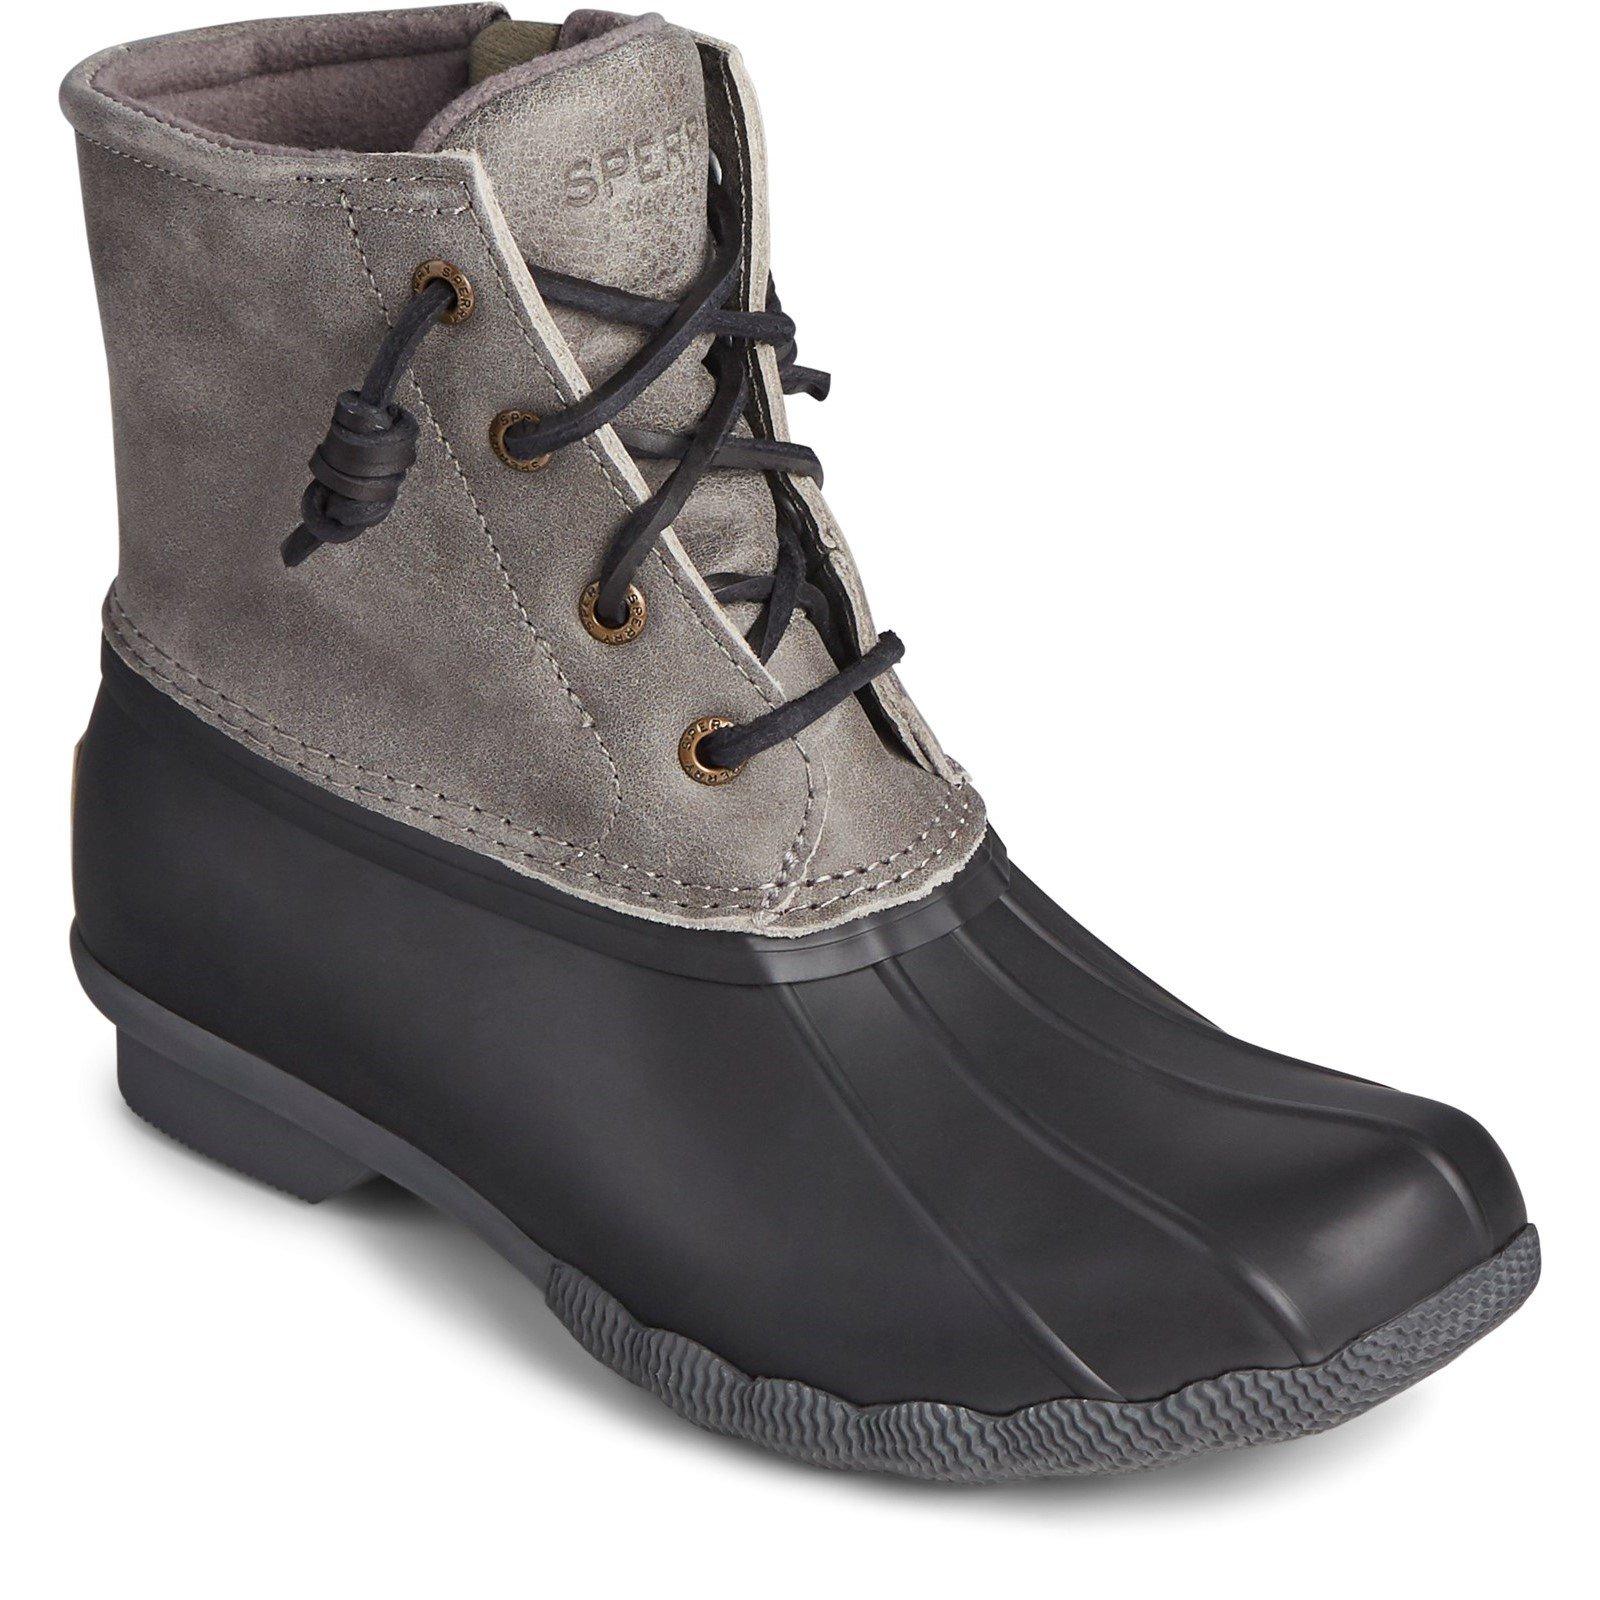 Sperry Women's Saltwater Core Mid Boot Multicolor 32407 - Black/Grey 7